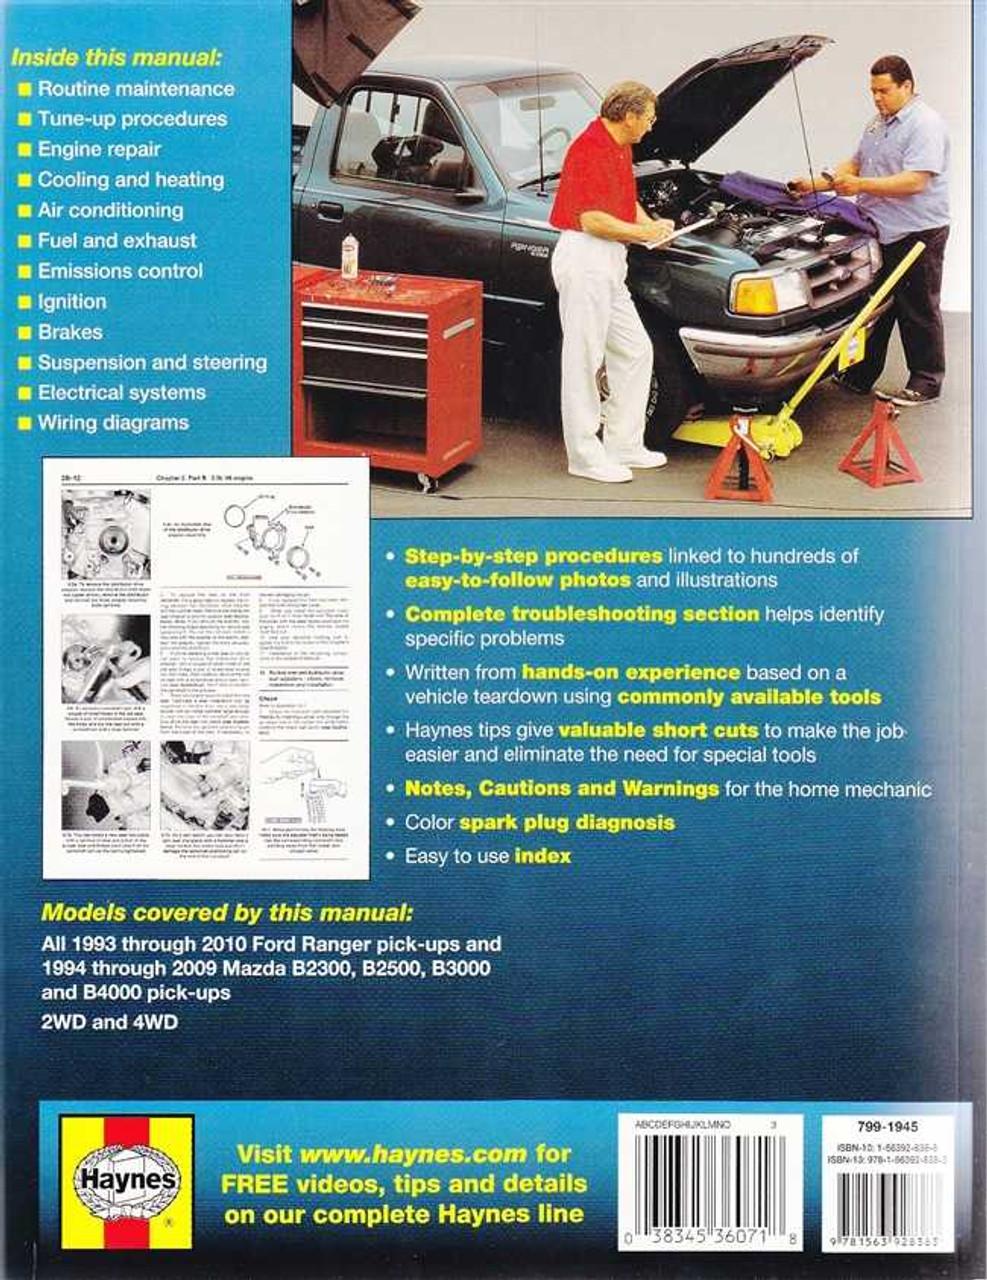 Wondrous Ford Ranger Mazda B2300 B2500 B3000 B4000 1993 2010 Workshop Wiring Cloud Oideiuggs Outletorg